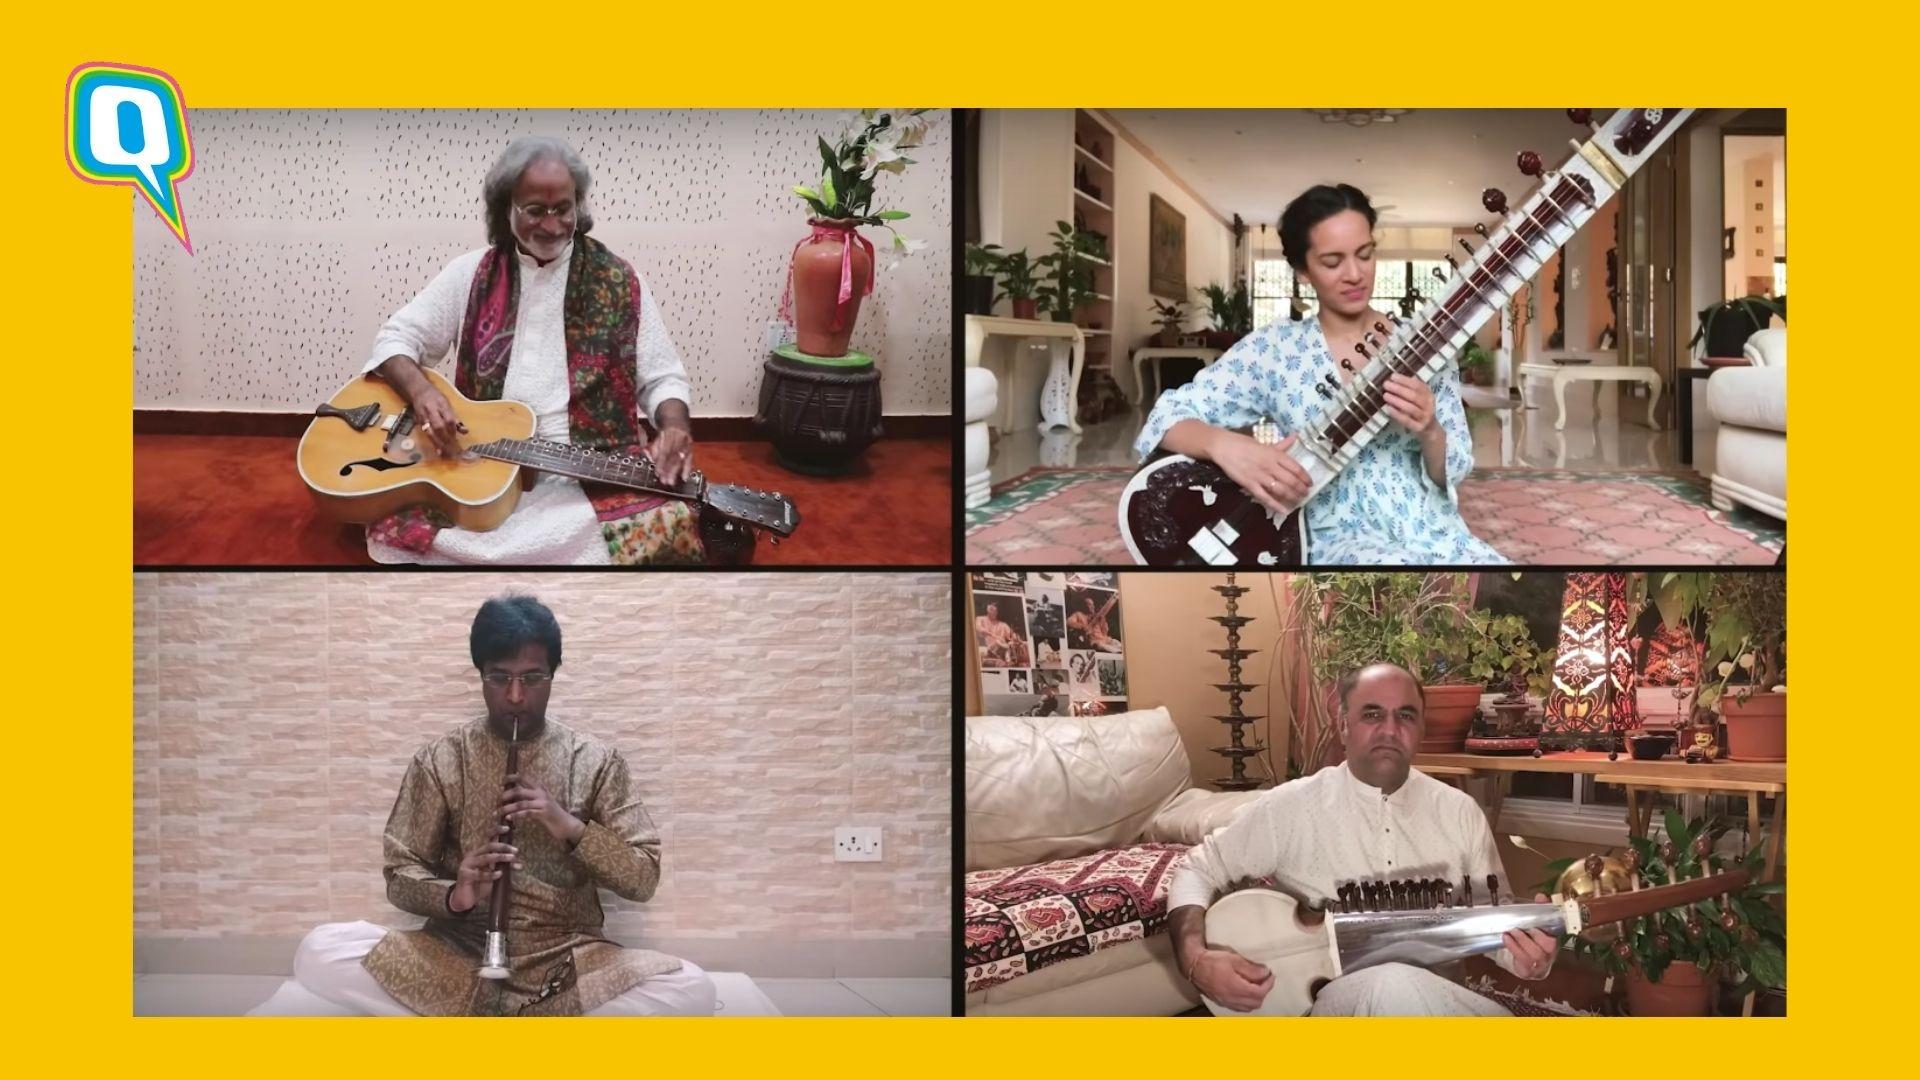 Anoushka Shankar's Tribute on Father Ravi Shankar's Anniversary